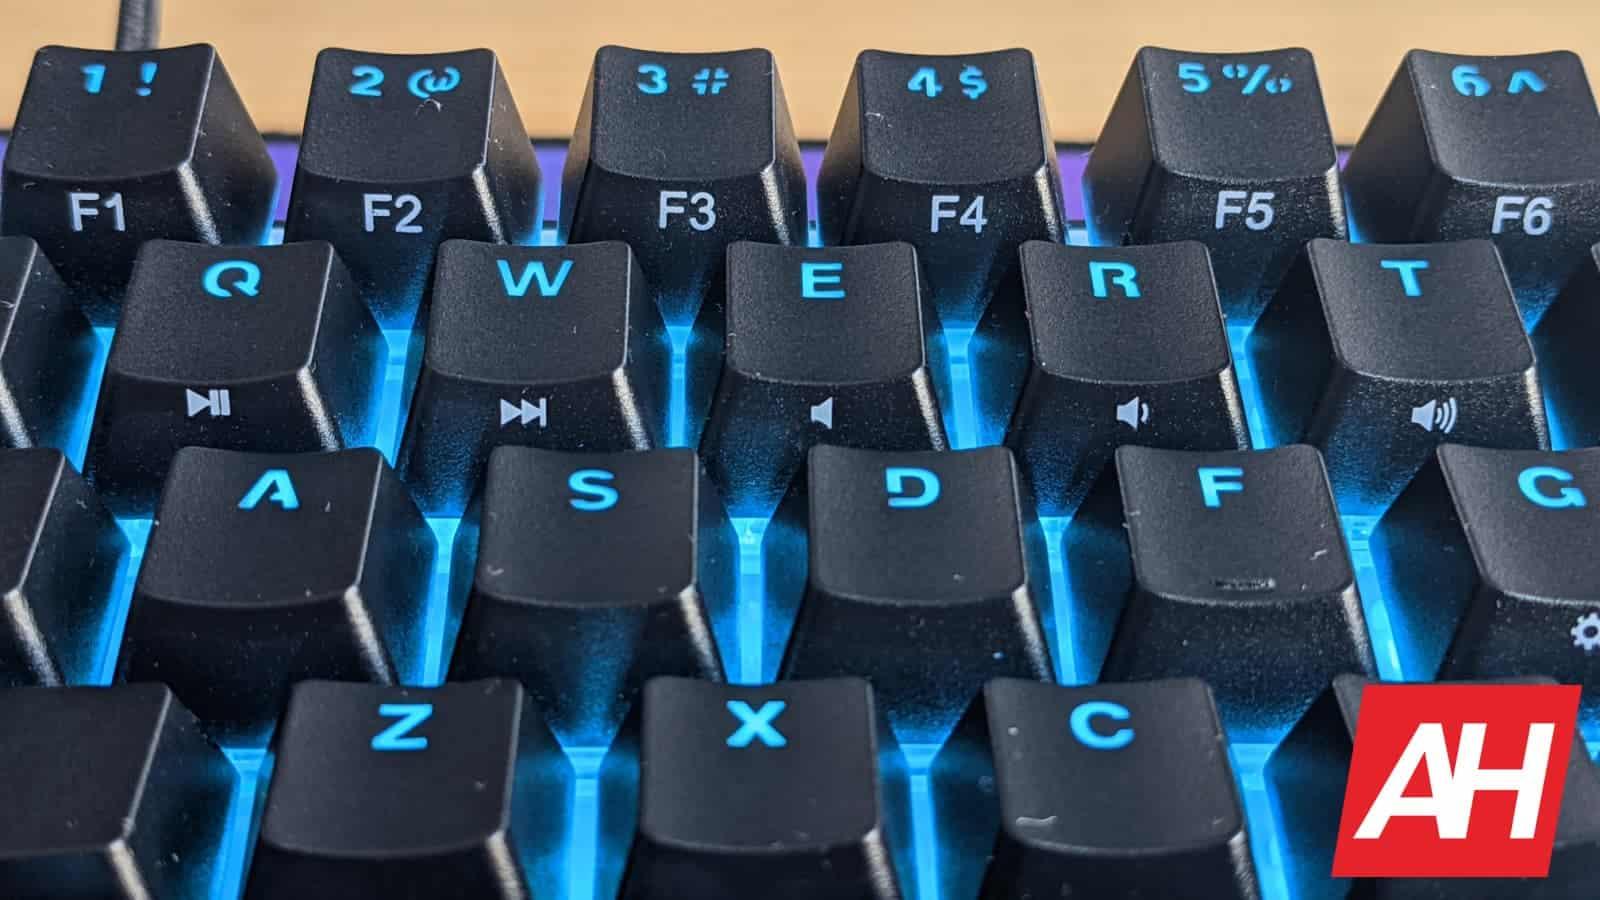 WhirlwindFX Atom 60 Gaming Keyboard Review 16